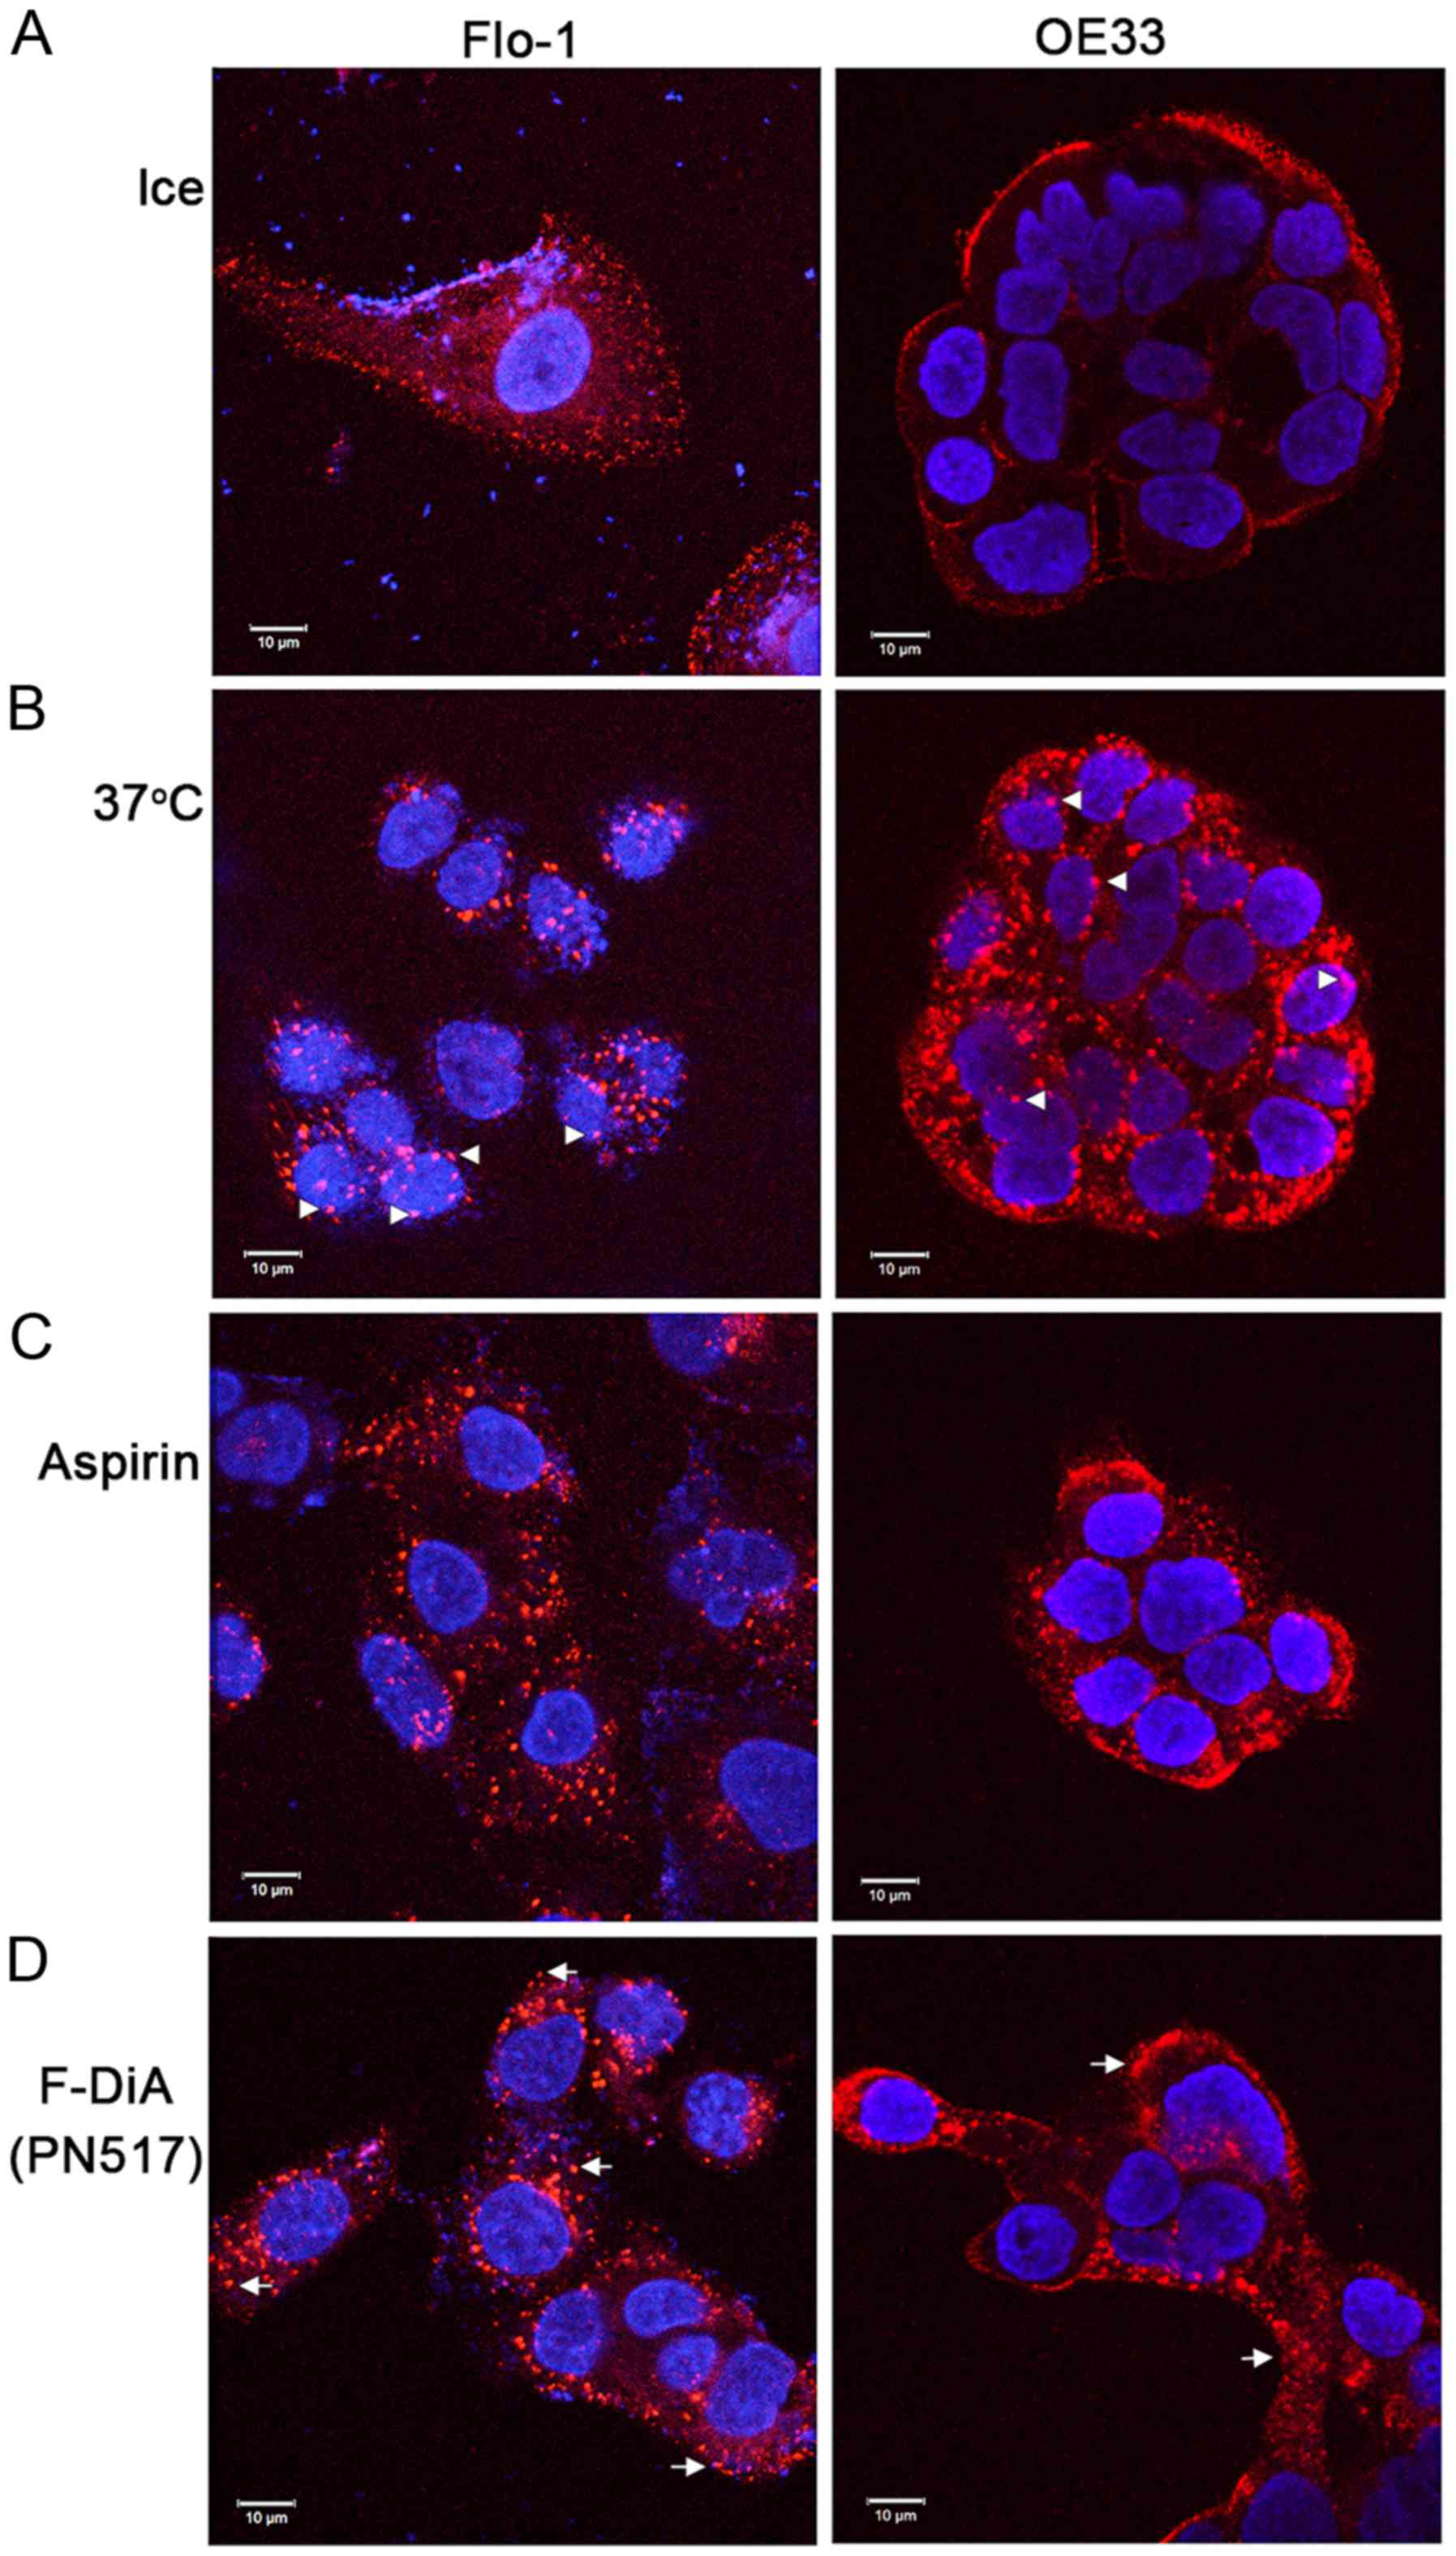 A novel mechanism for the anticancer activity of aspirin and salicylates